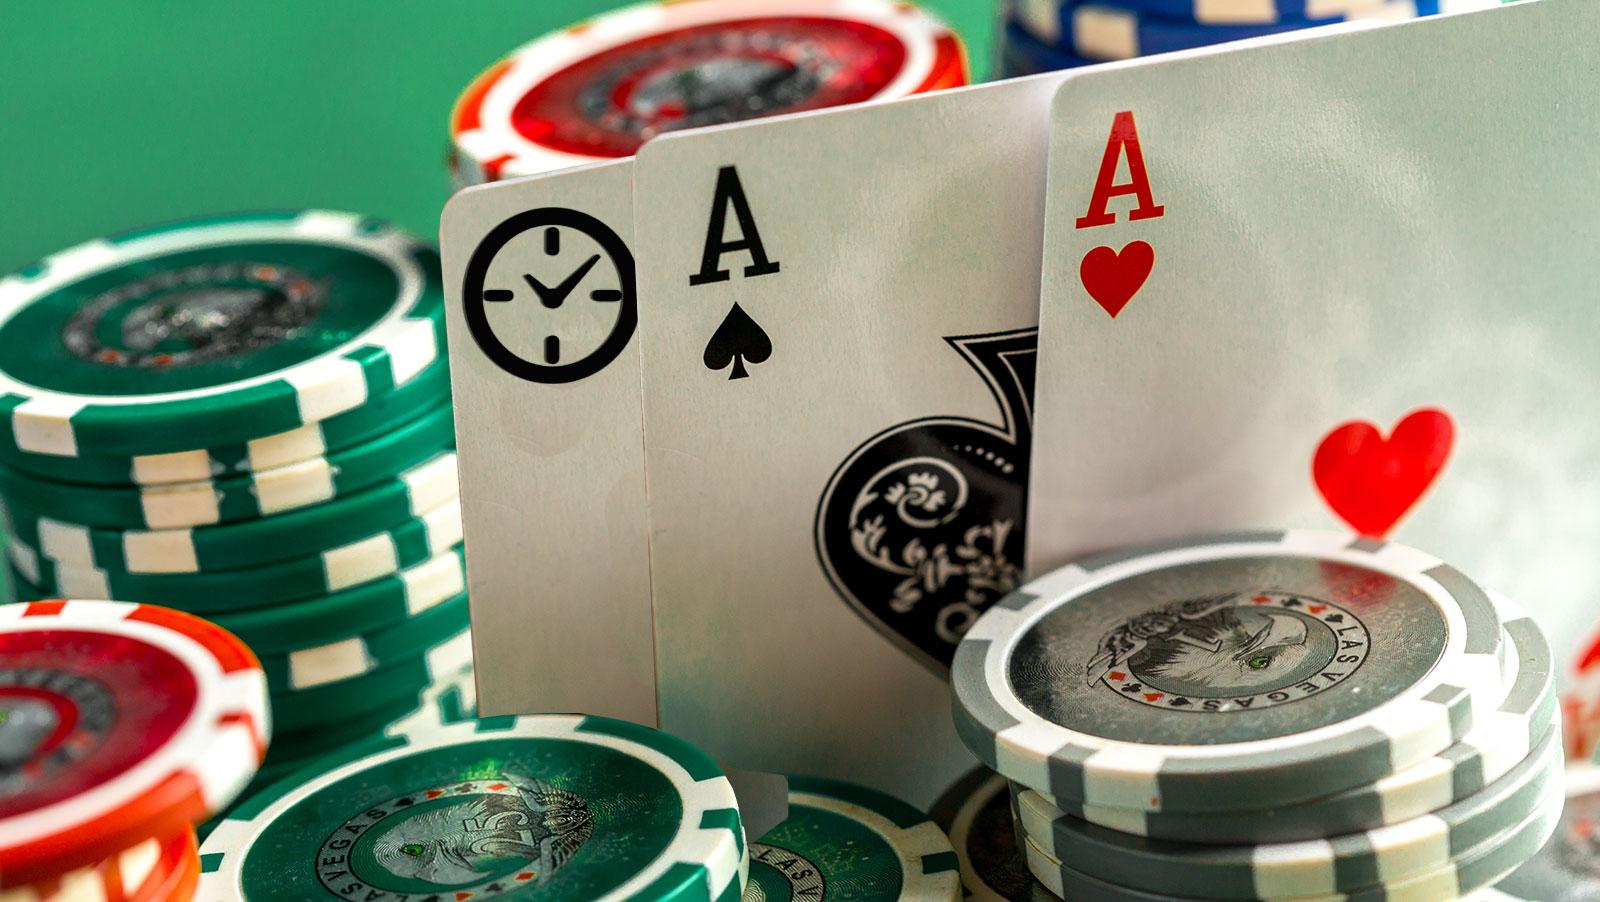 Blackjack rules of thumb